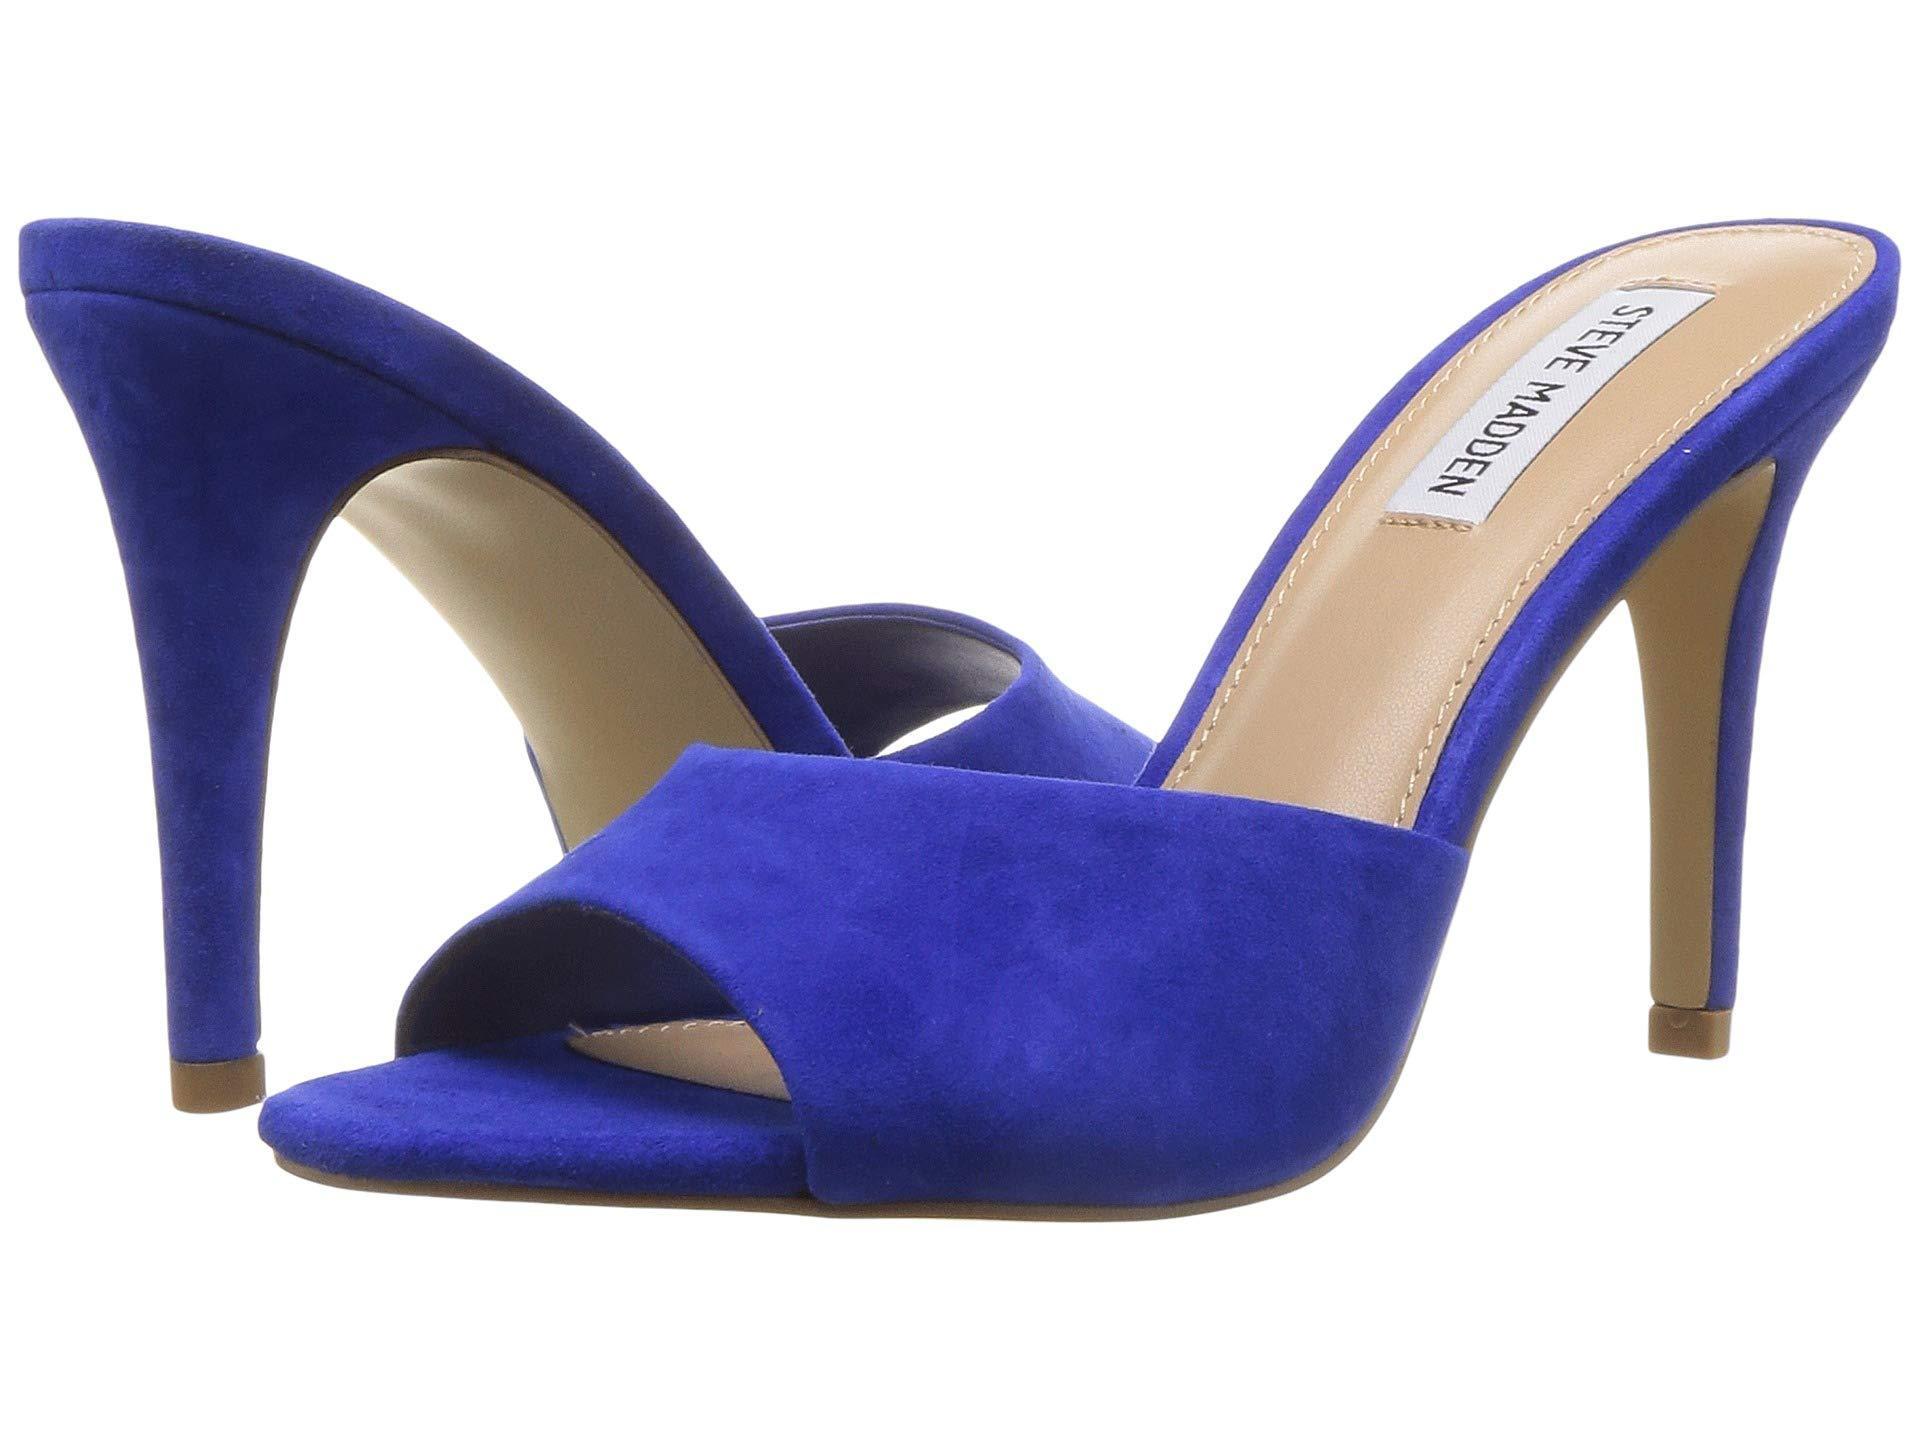 0c445704de0 Lyst - Steve Madden Erin Heeled Mule (pink Neon) High Heels in Blue